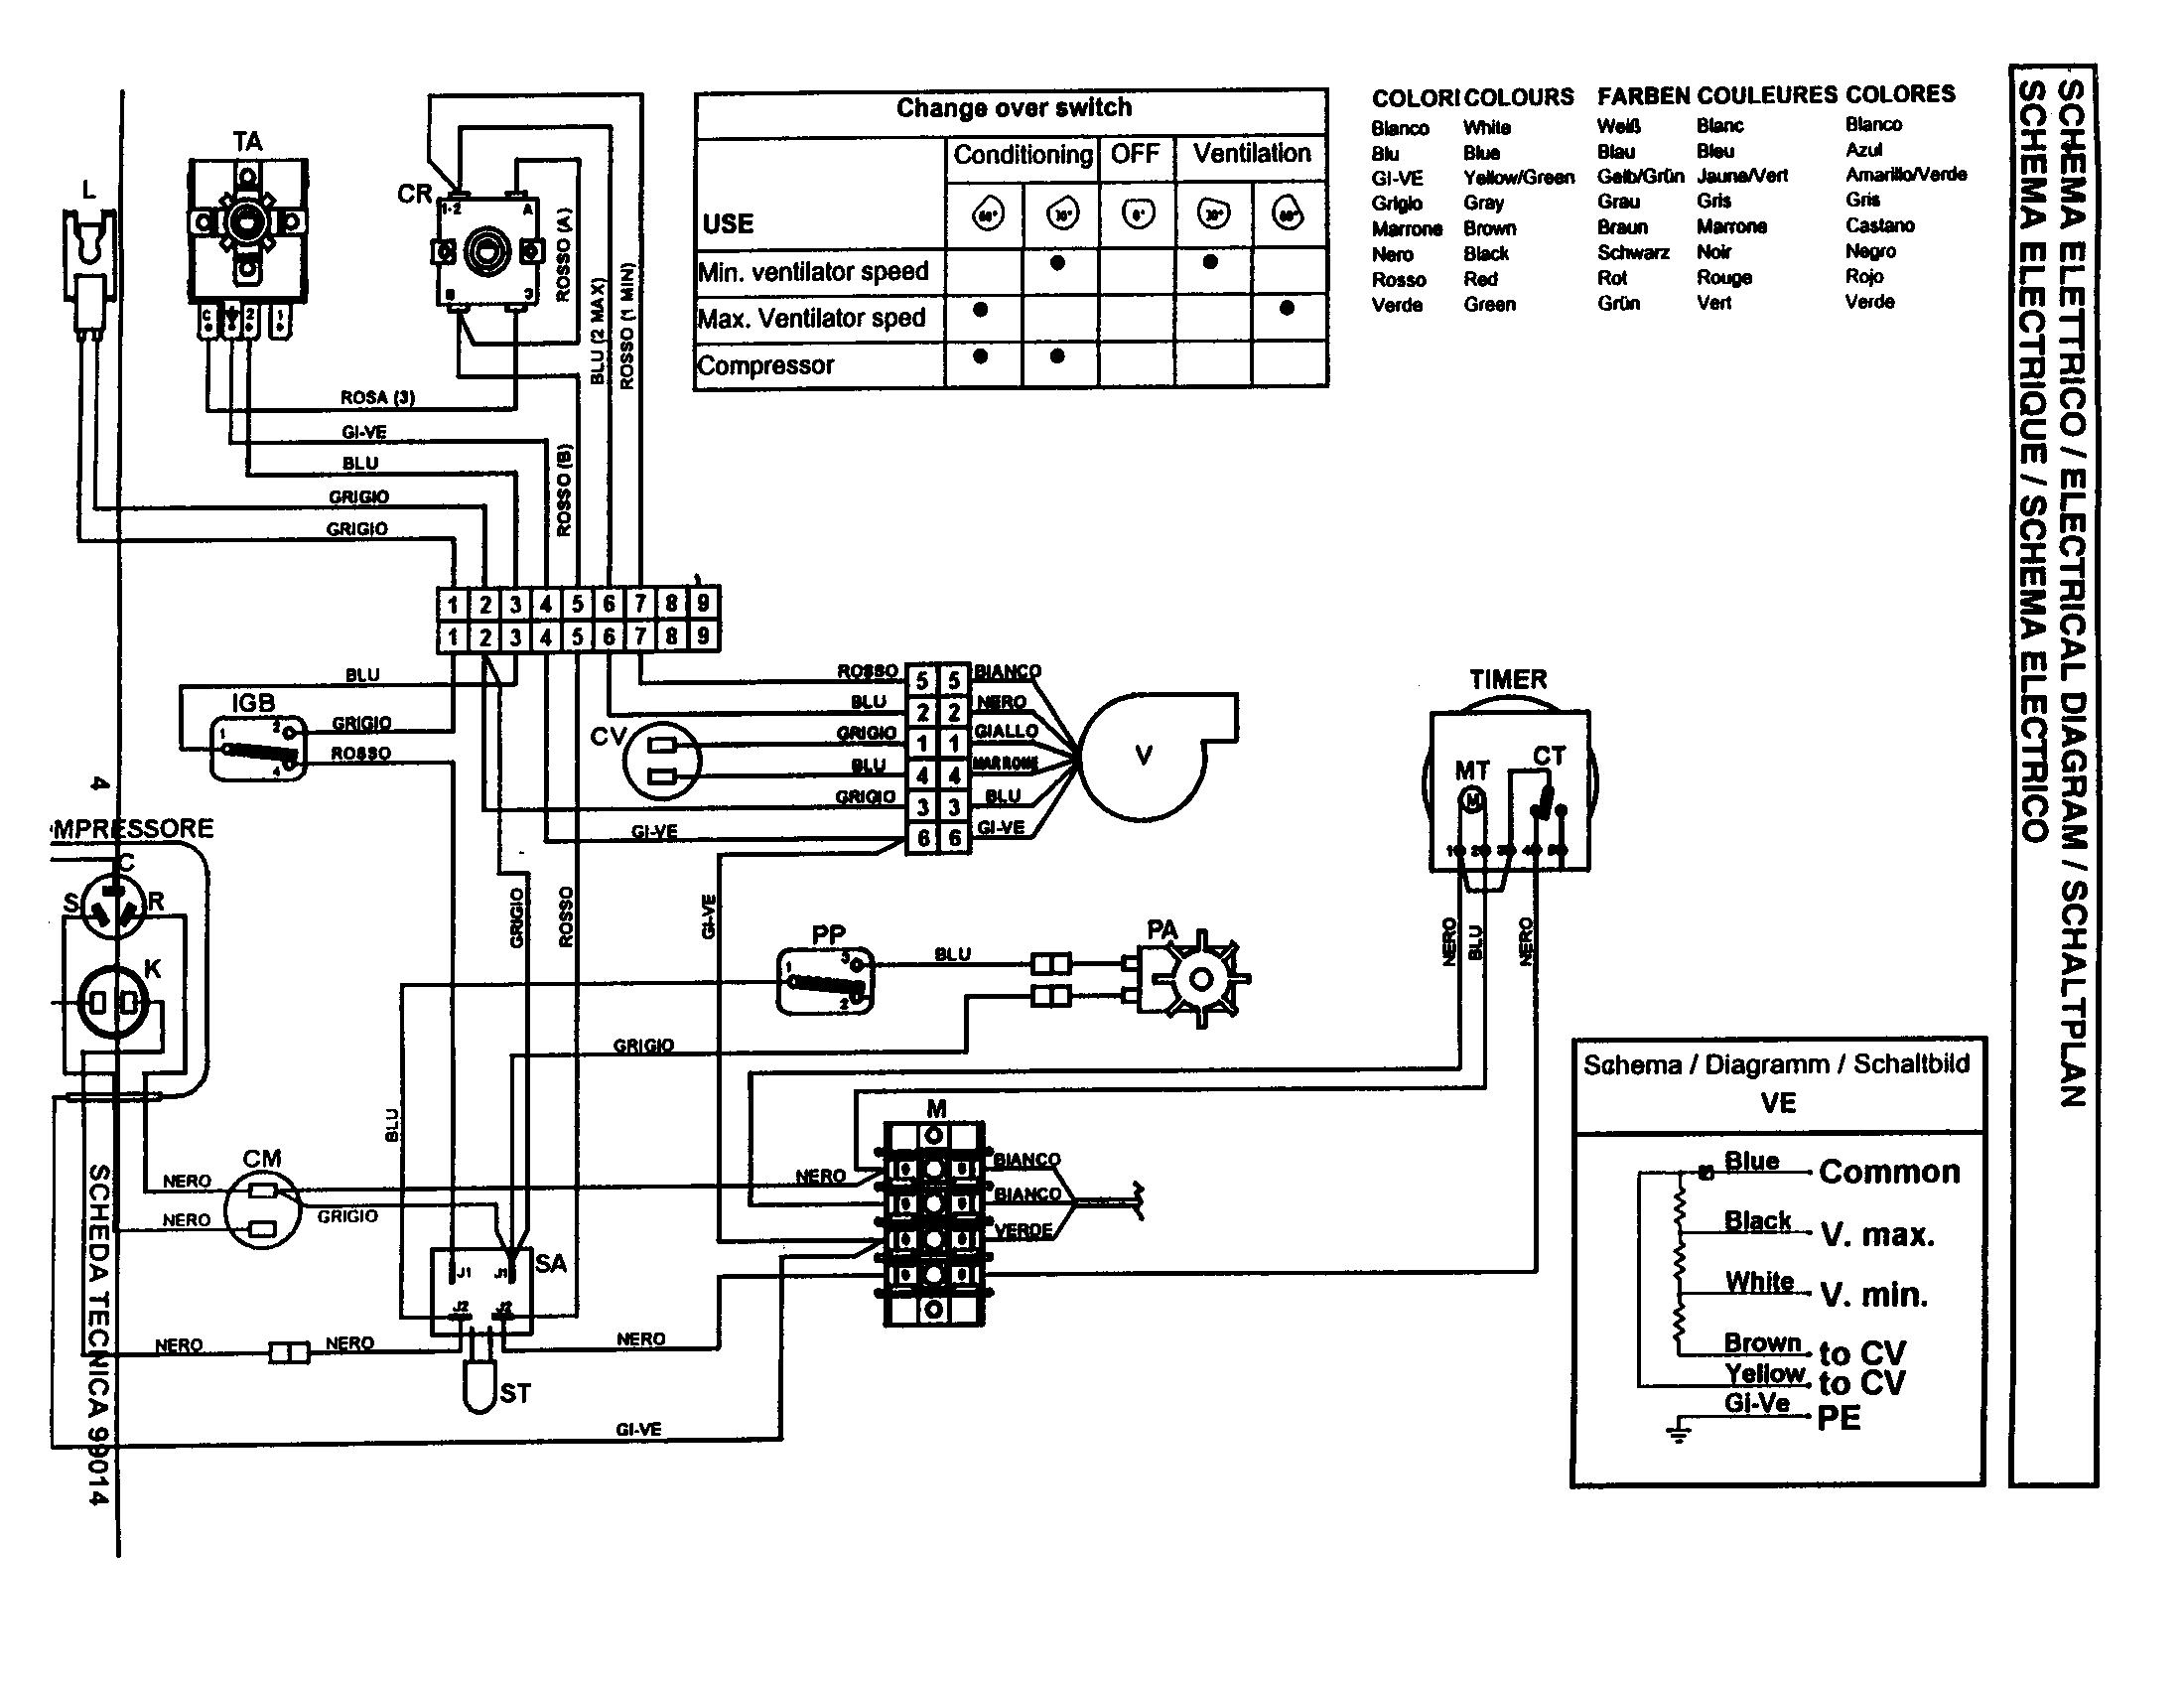 2010 camaro ac schematic [ 2200 x 1696 Pixel ]